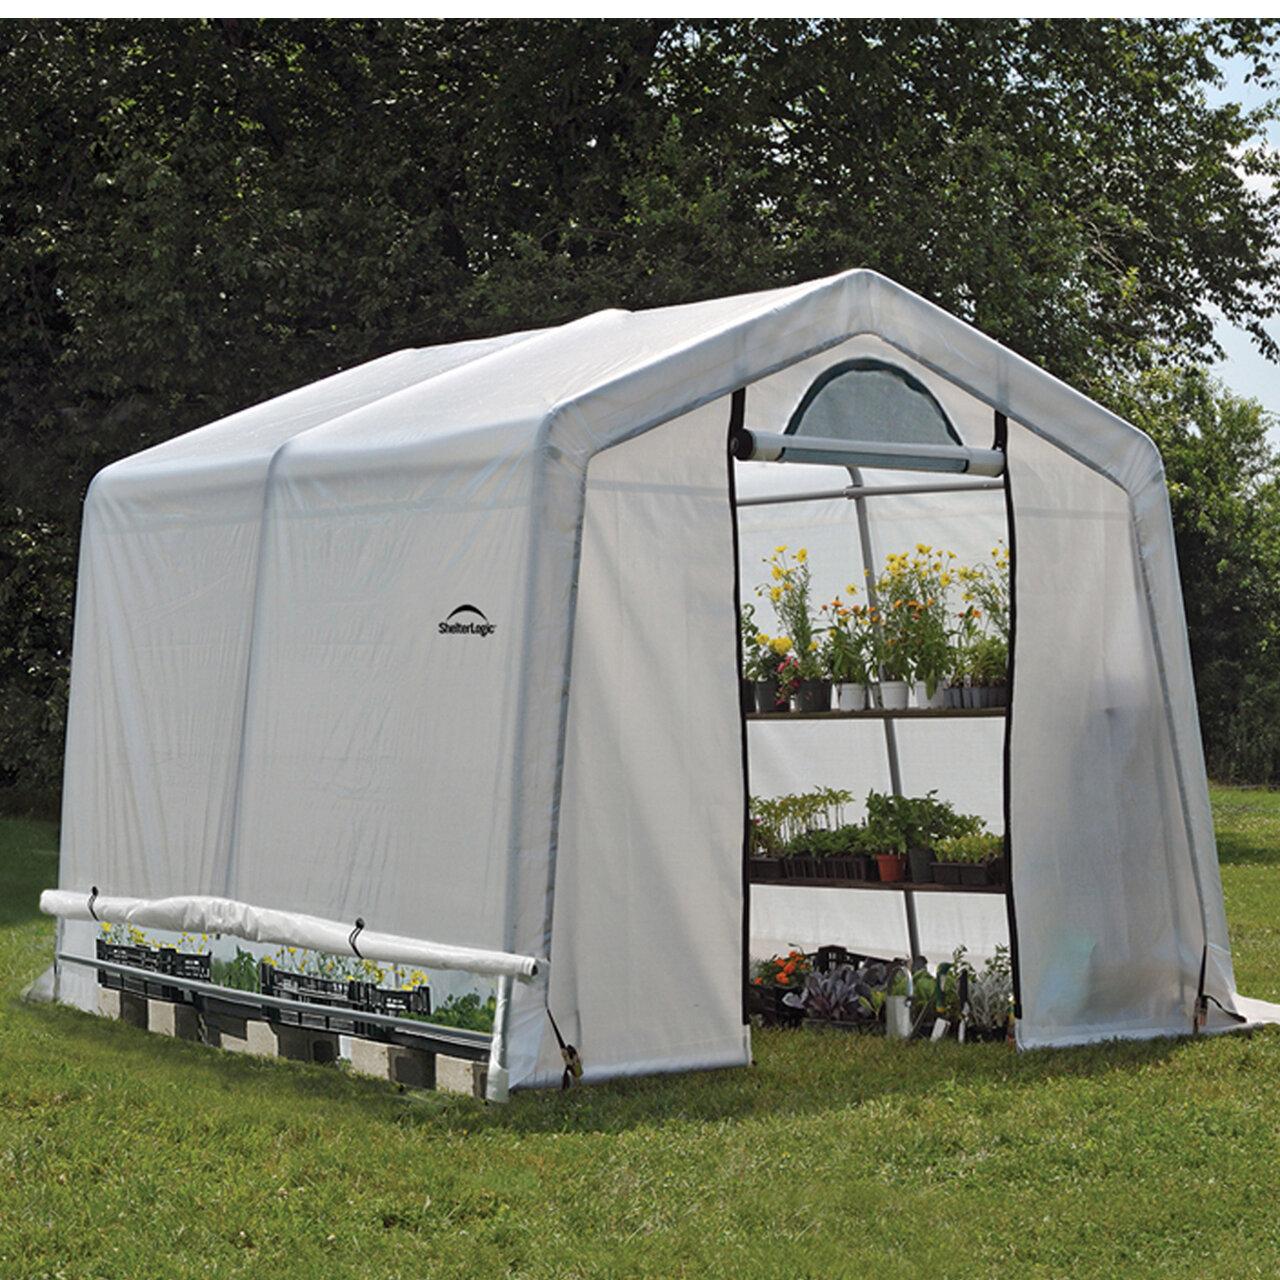 Shelterlogic Growit 9 W X 10 D Hobby Greenhouse Reviews Wayfair Growit backyard greenhouse reviews